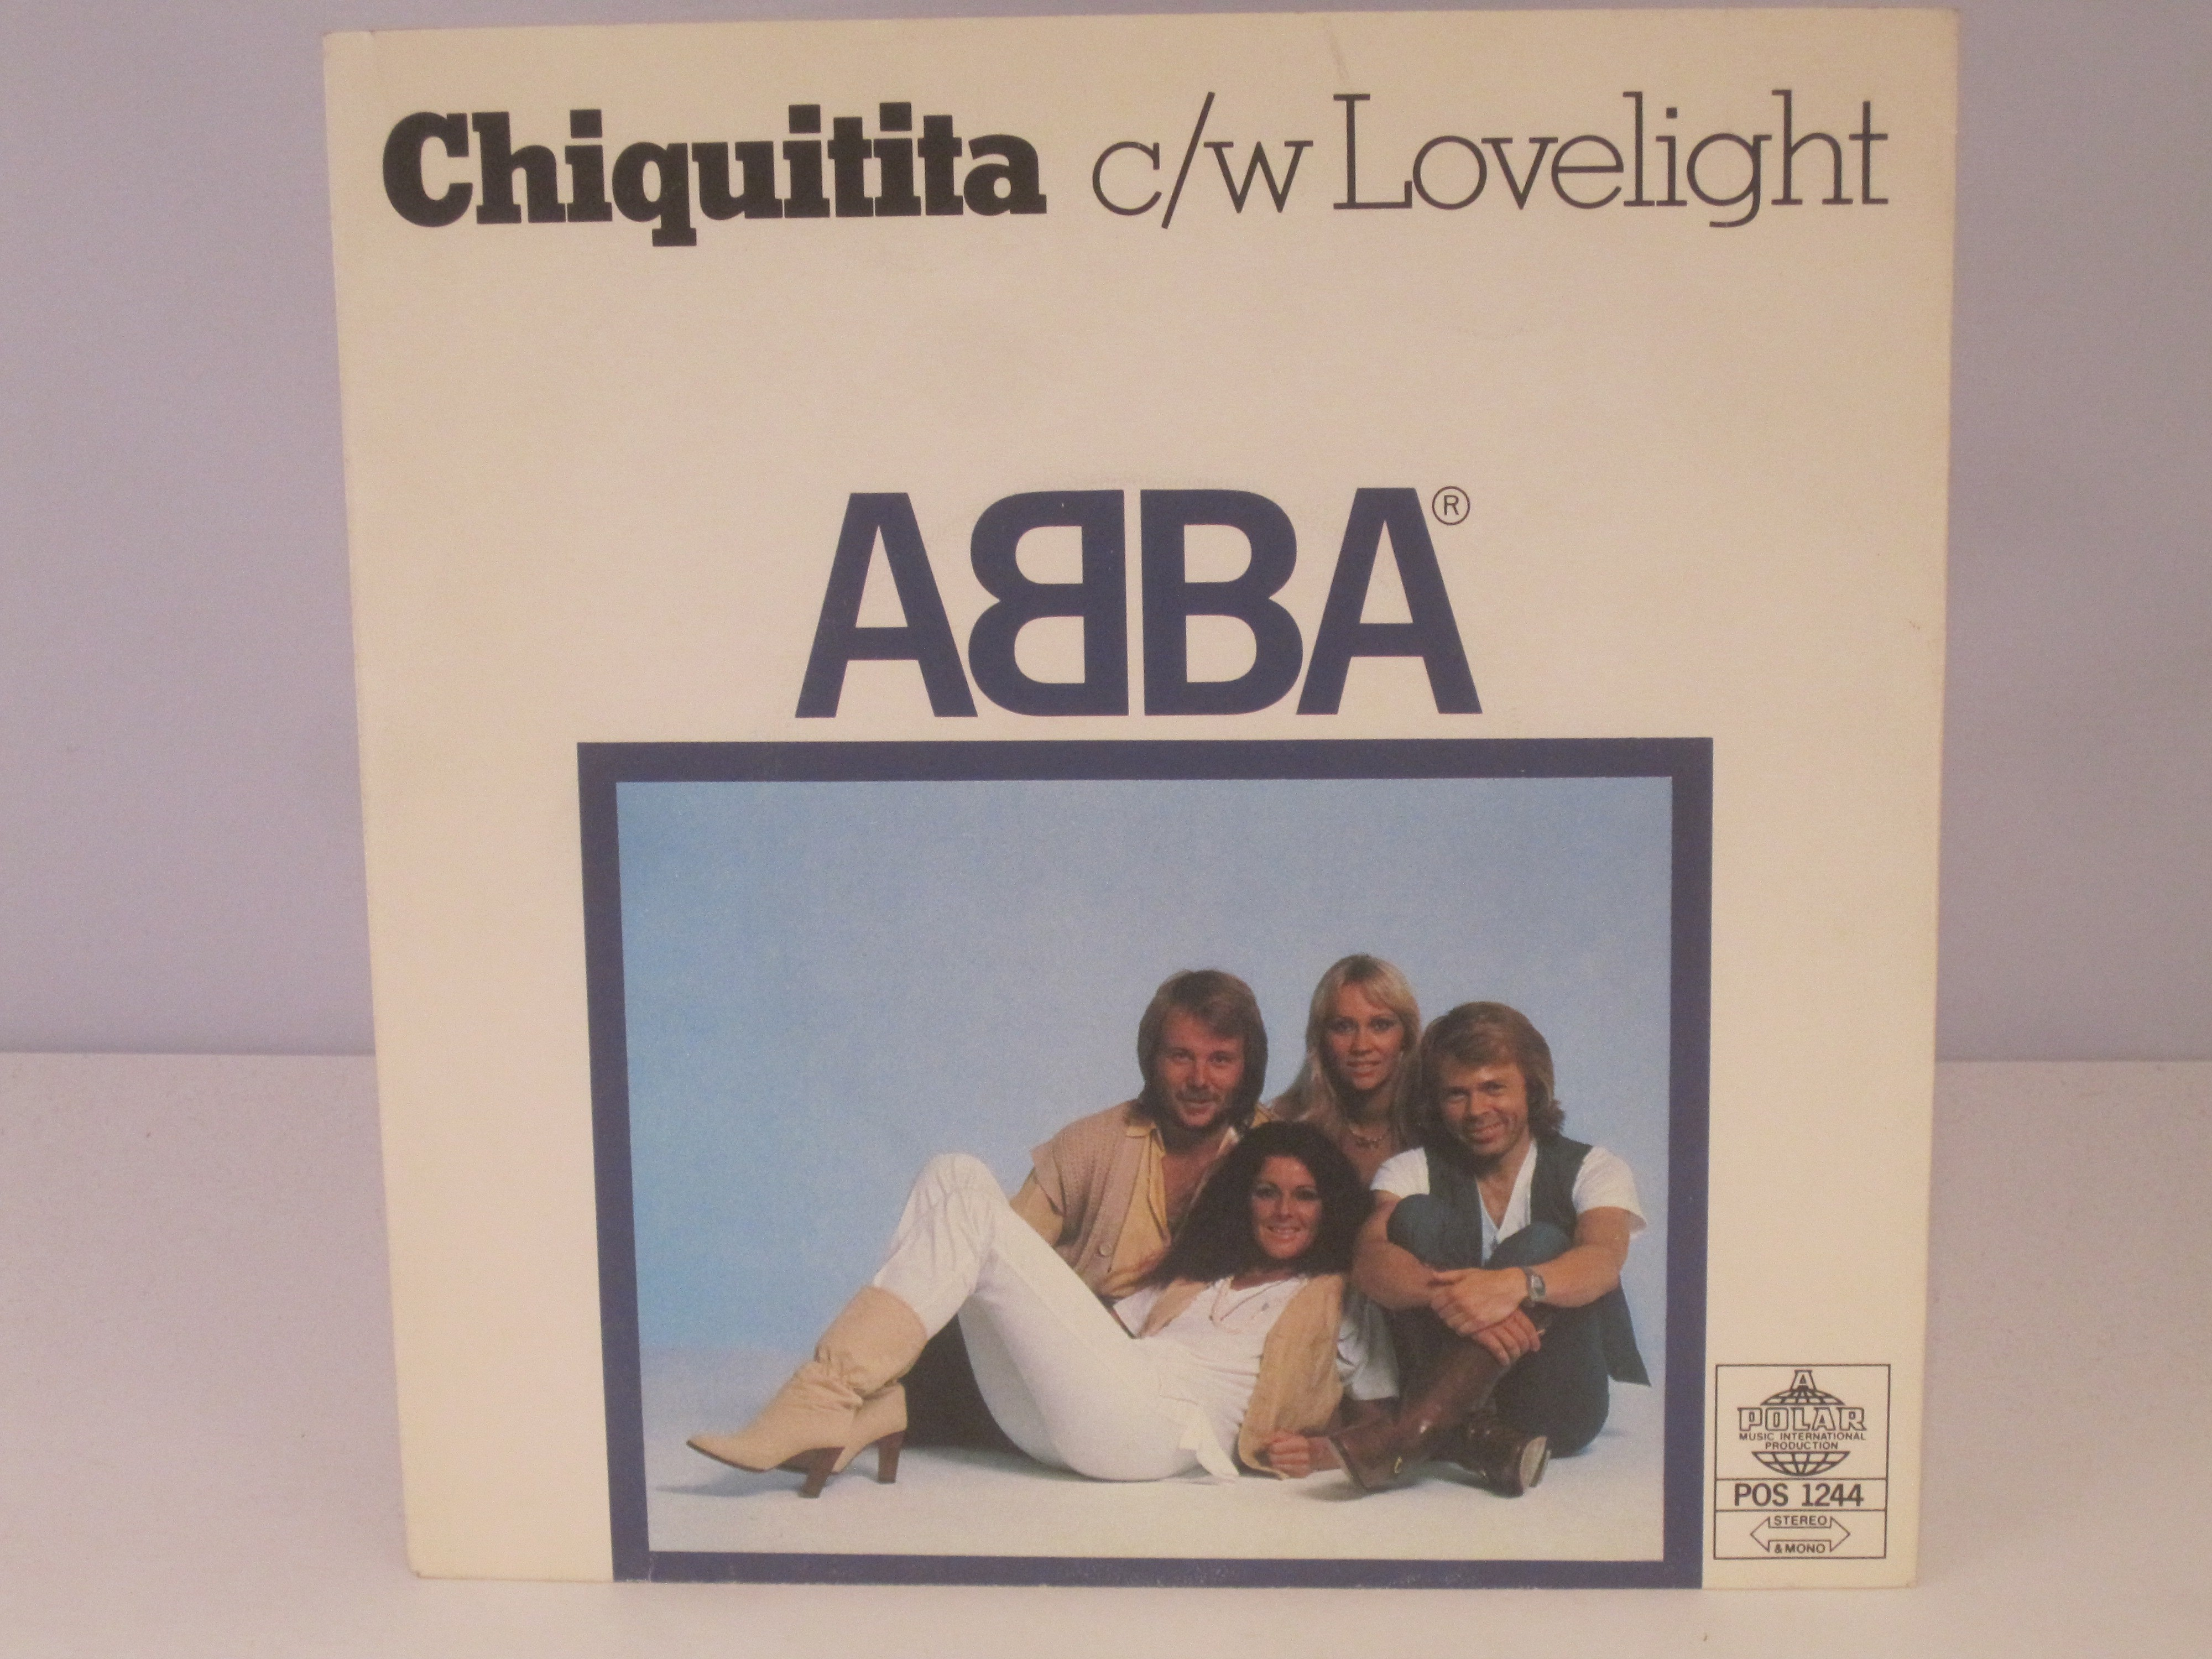 ABBA : Chiquitita / Lovelight